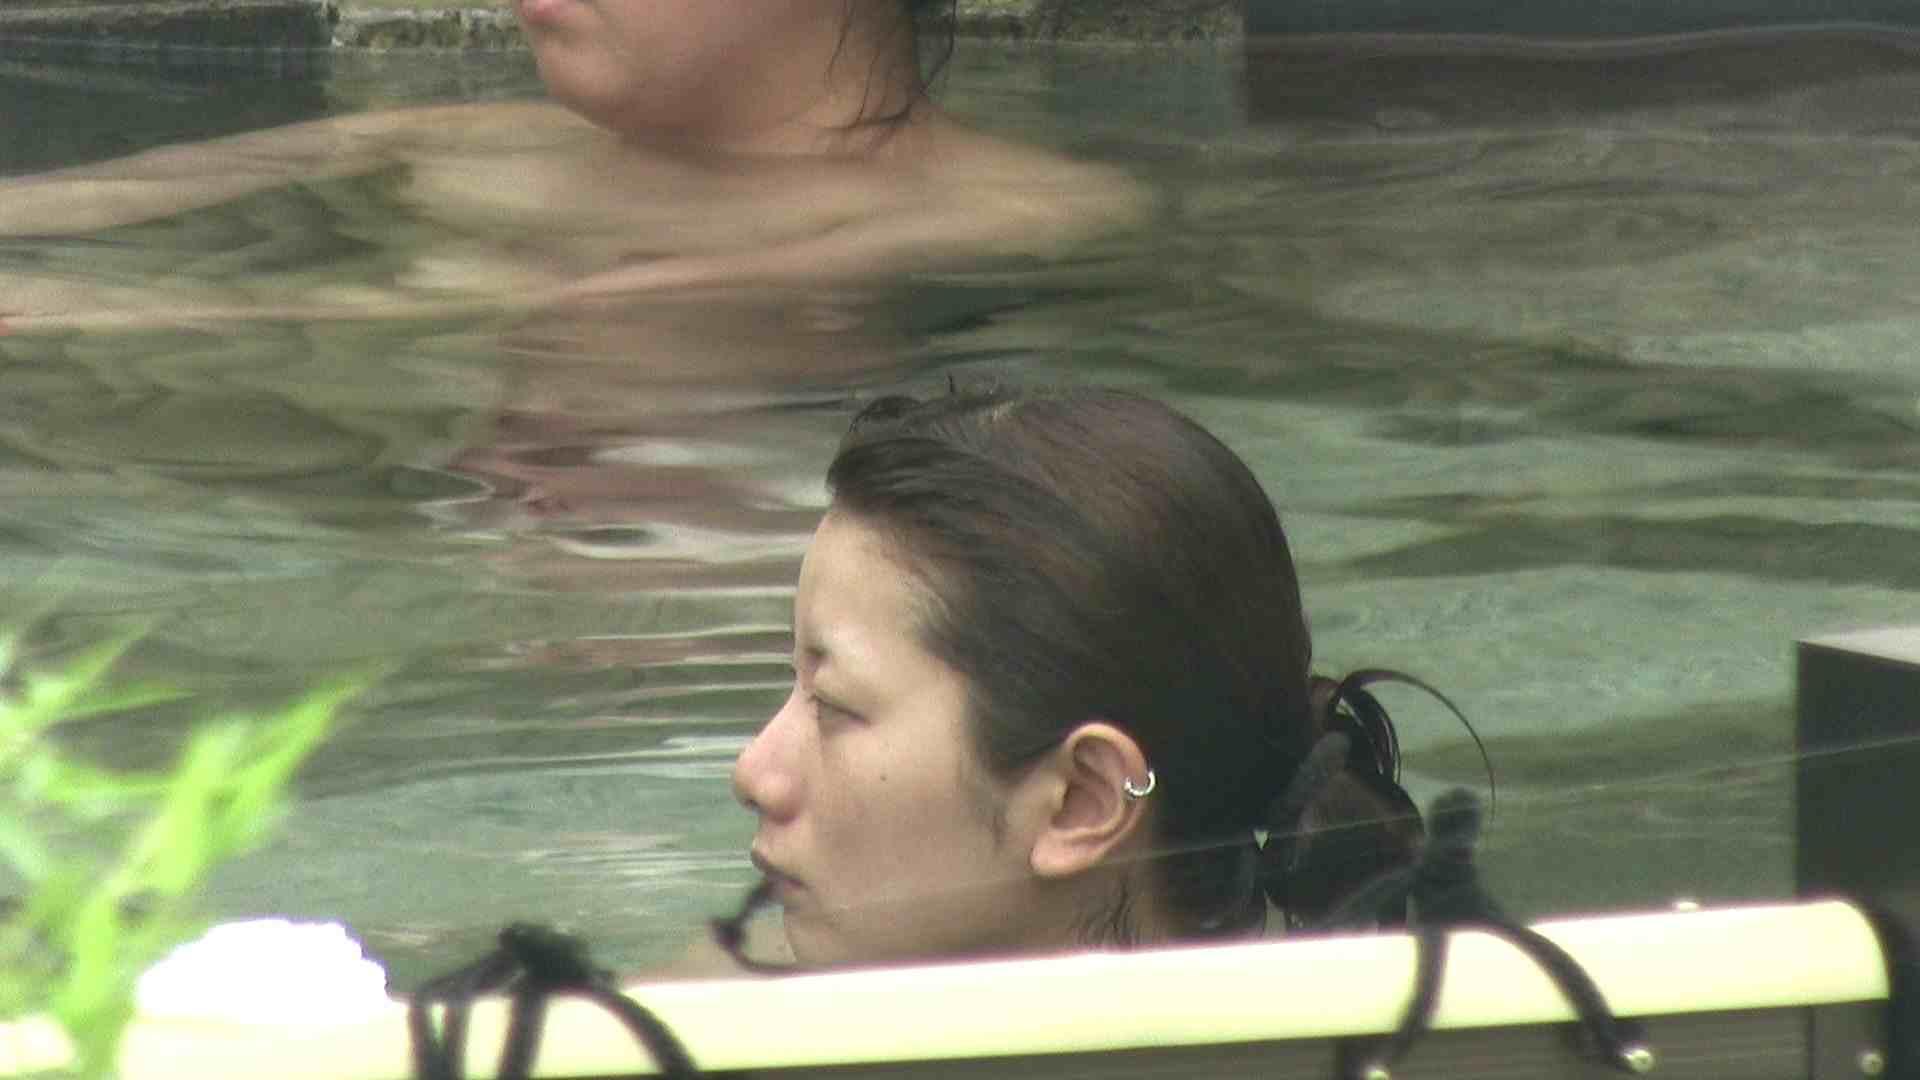 Aquaな露天風呂Vol.19【VIP】 盗撮 | HなOL  88pic 63